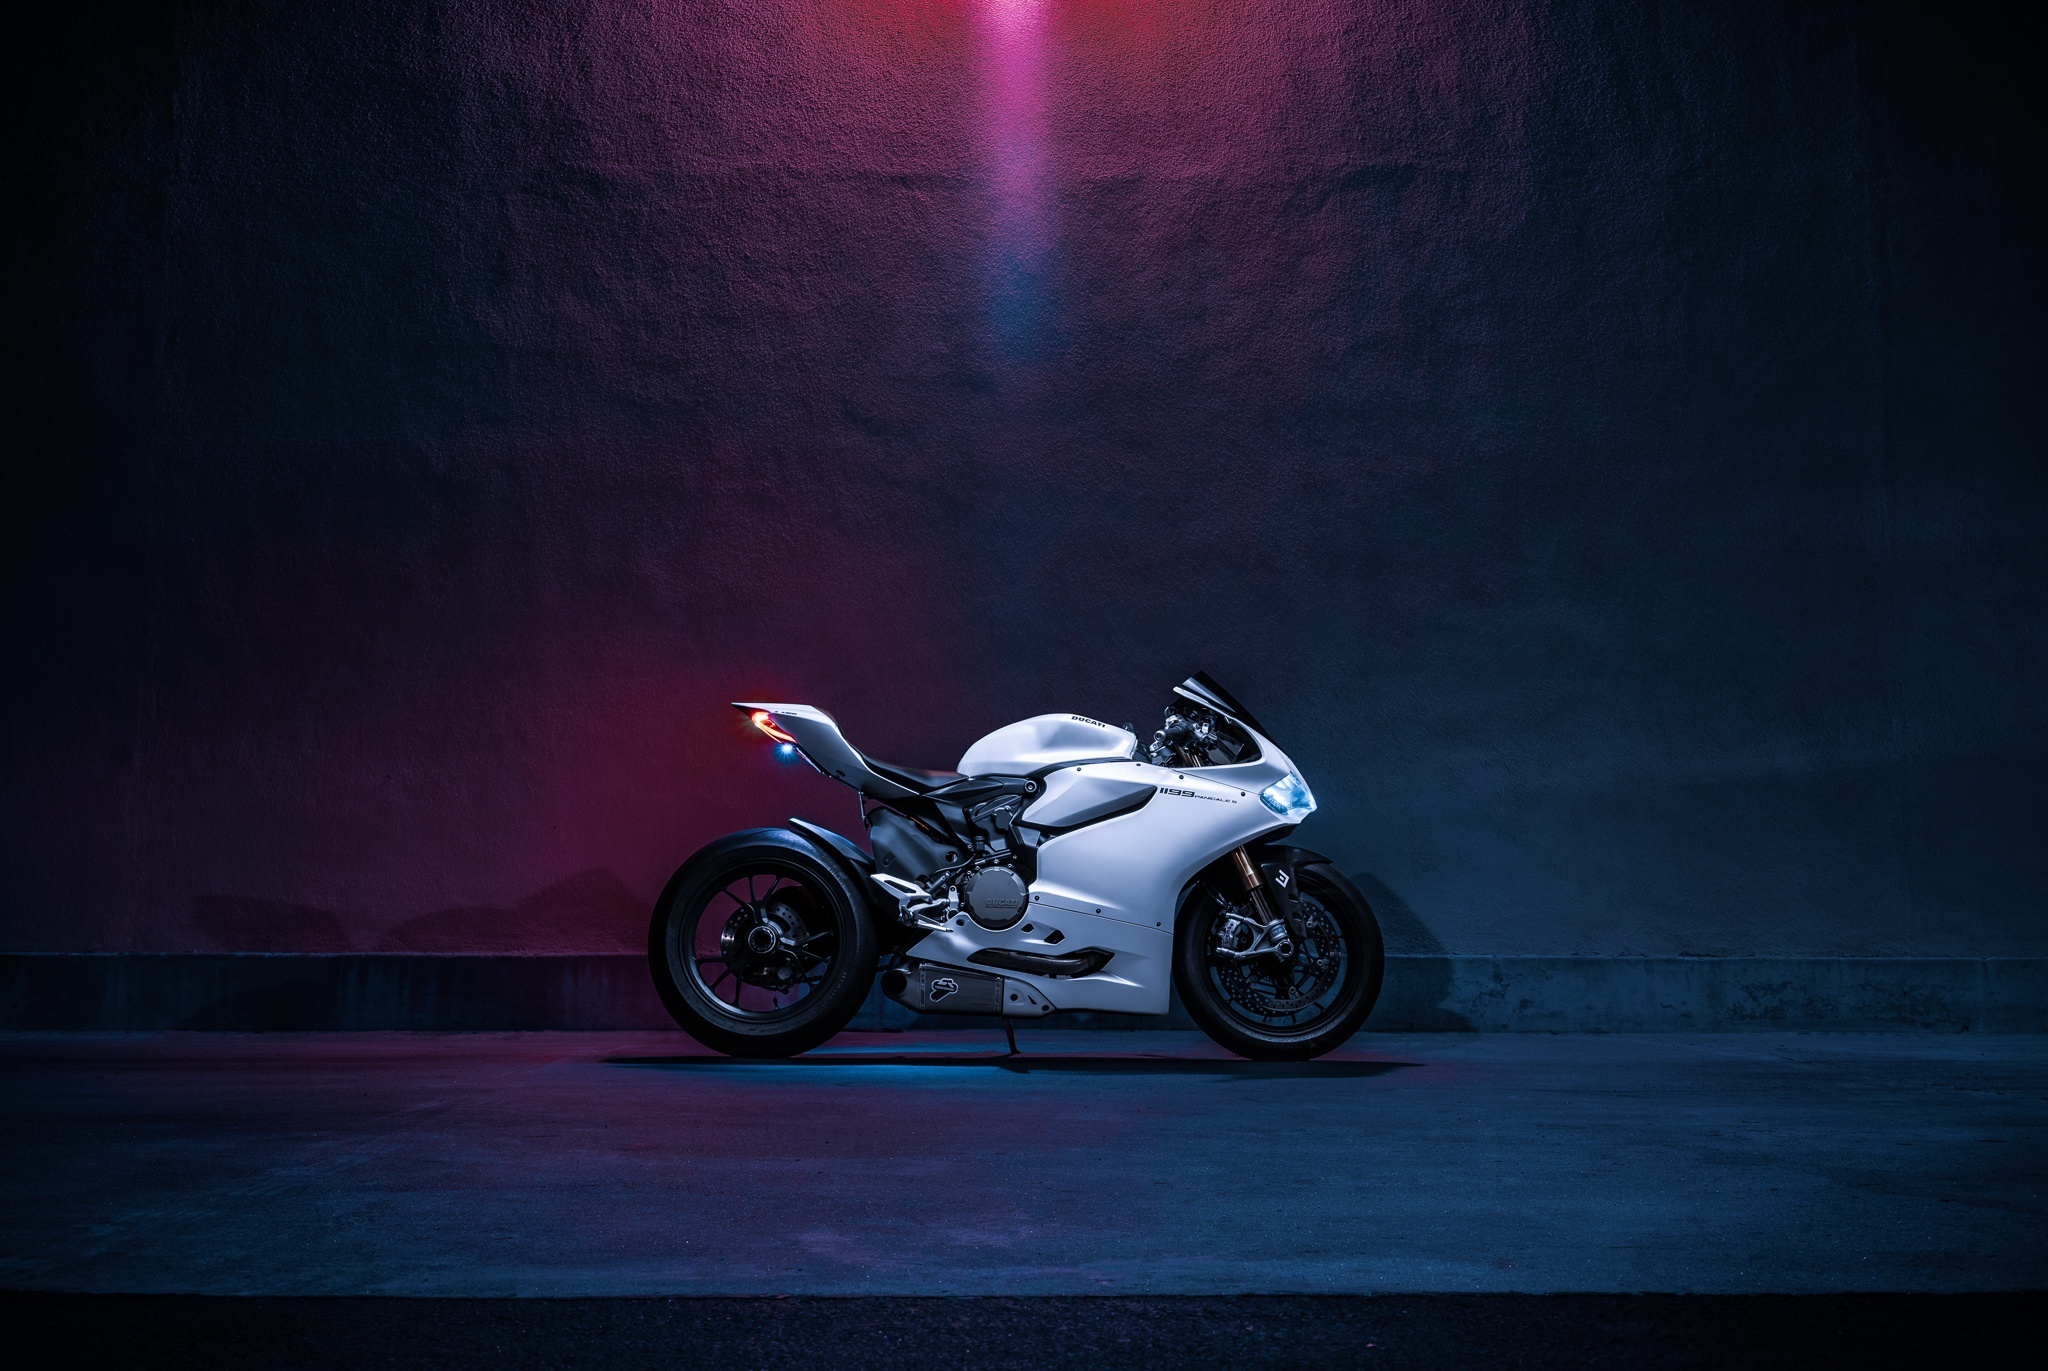 Мотоцикл Ducati море  № 3435486 загрузить